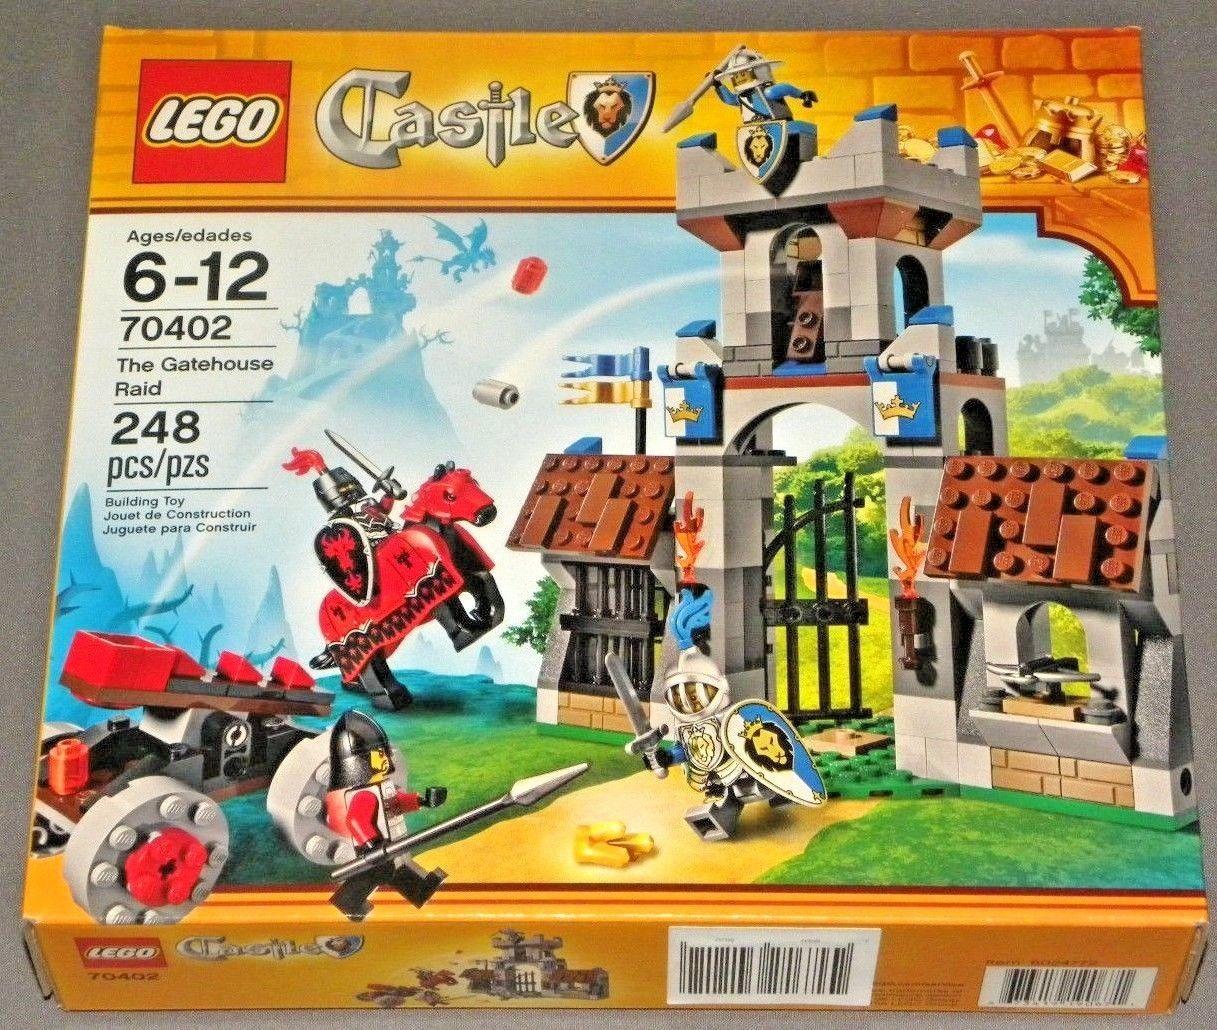 New In Box Lego Castle Set 70402 The Gatehouse Raid Knights Horse